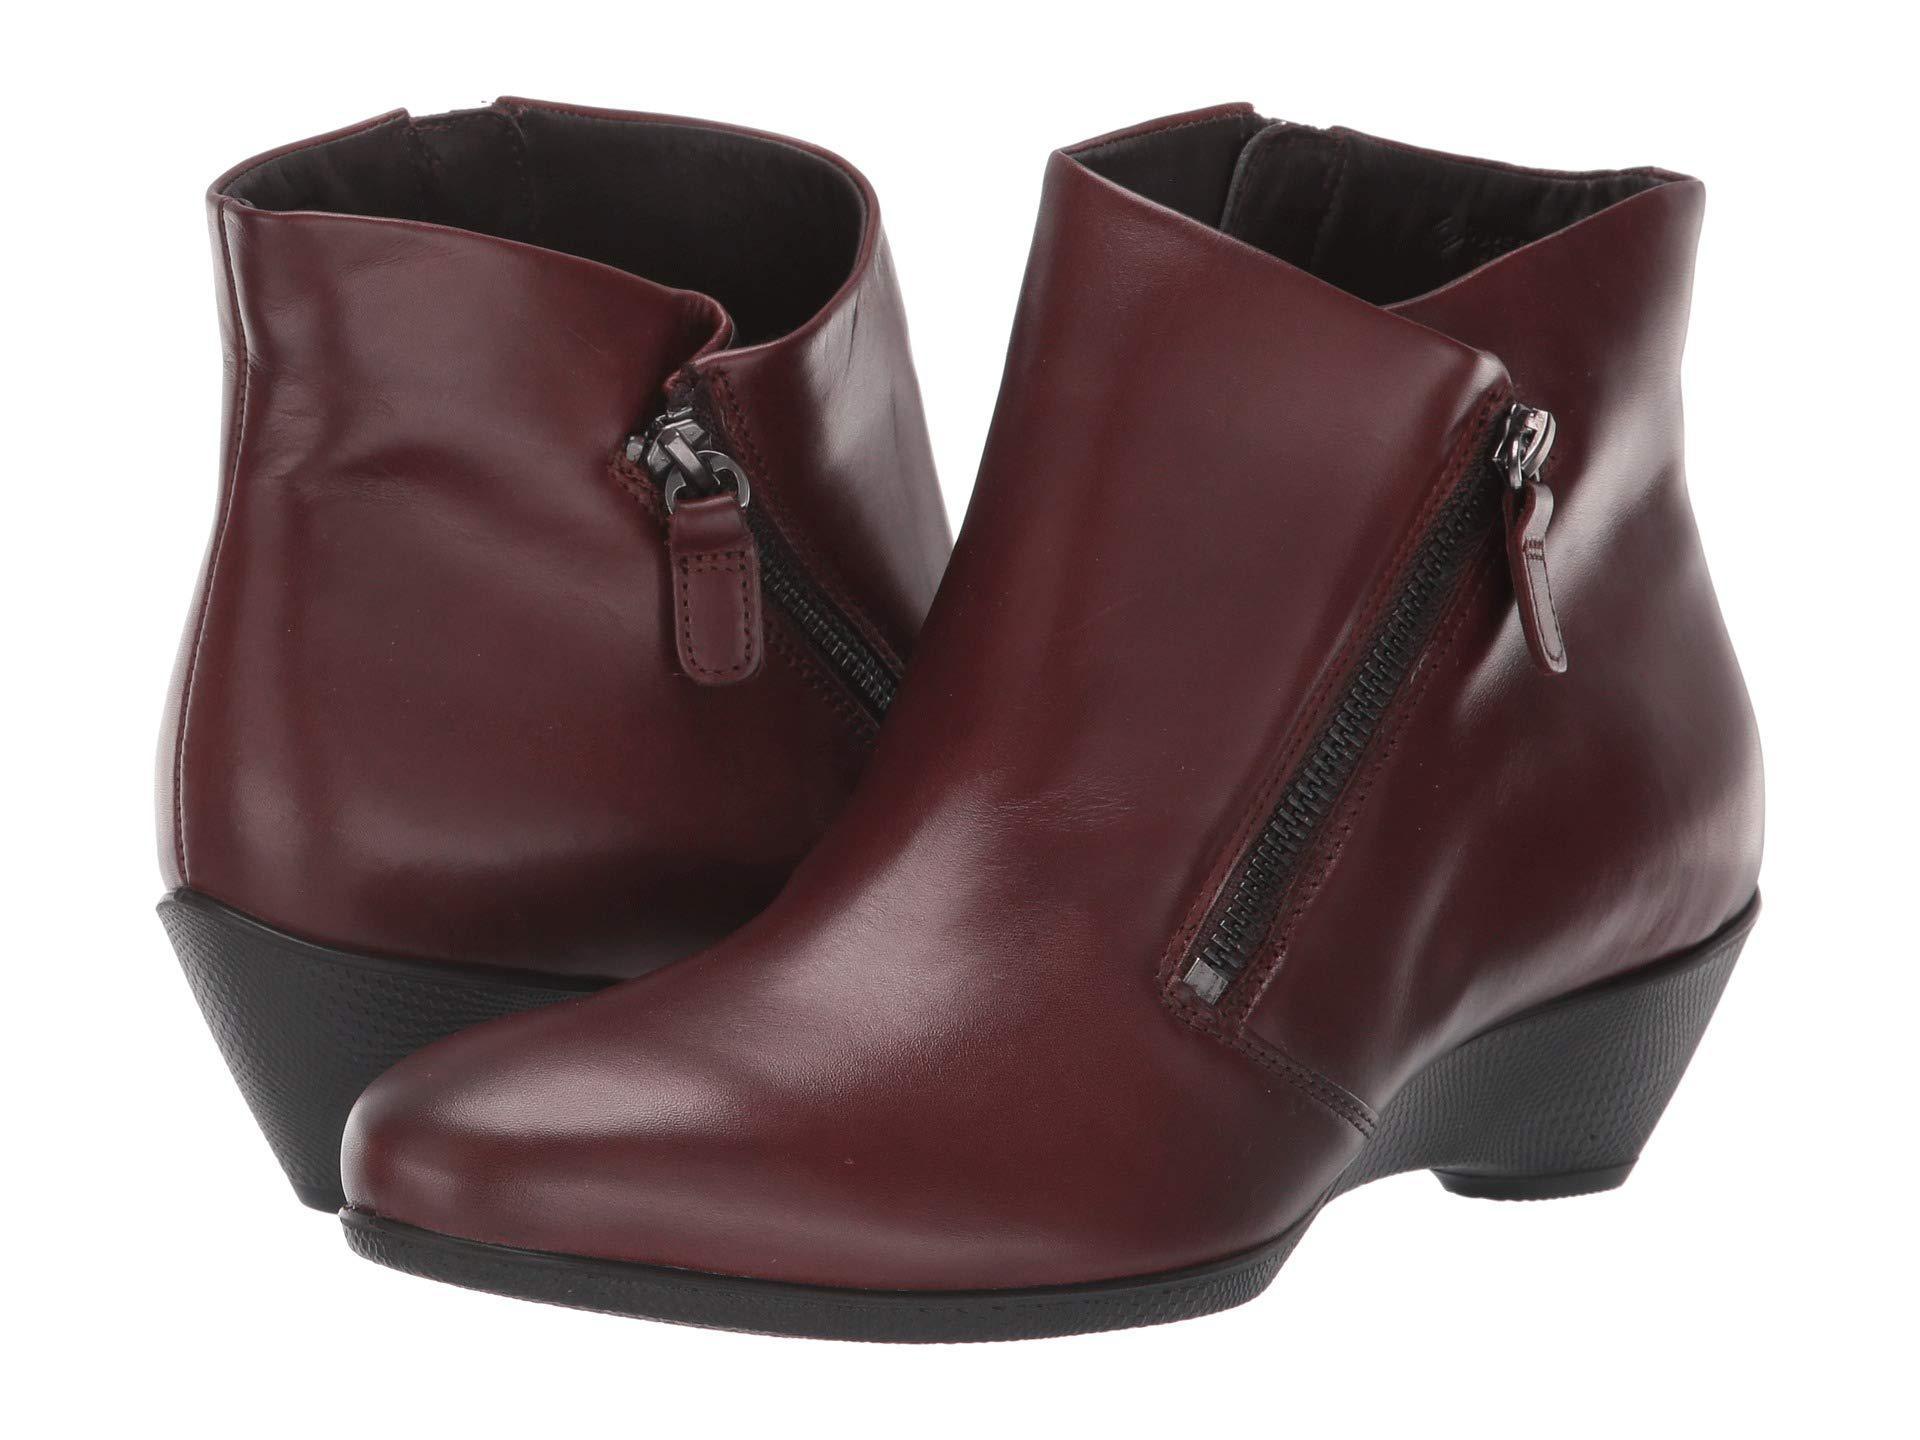 b2b5a0c513df8 Ecco - Multicolor Sculptured 45 Bootie W/ Zip (brandy Calf Leather) Women's  Boots